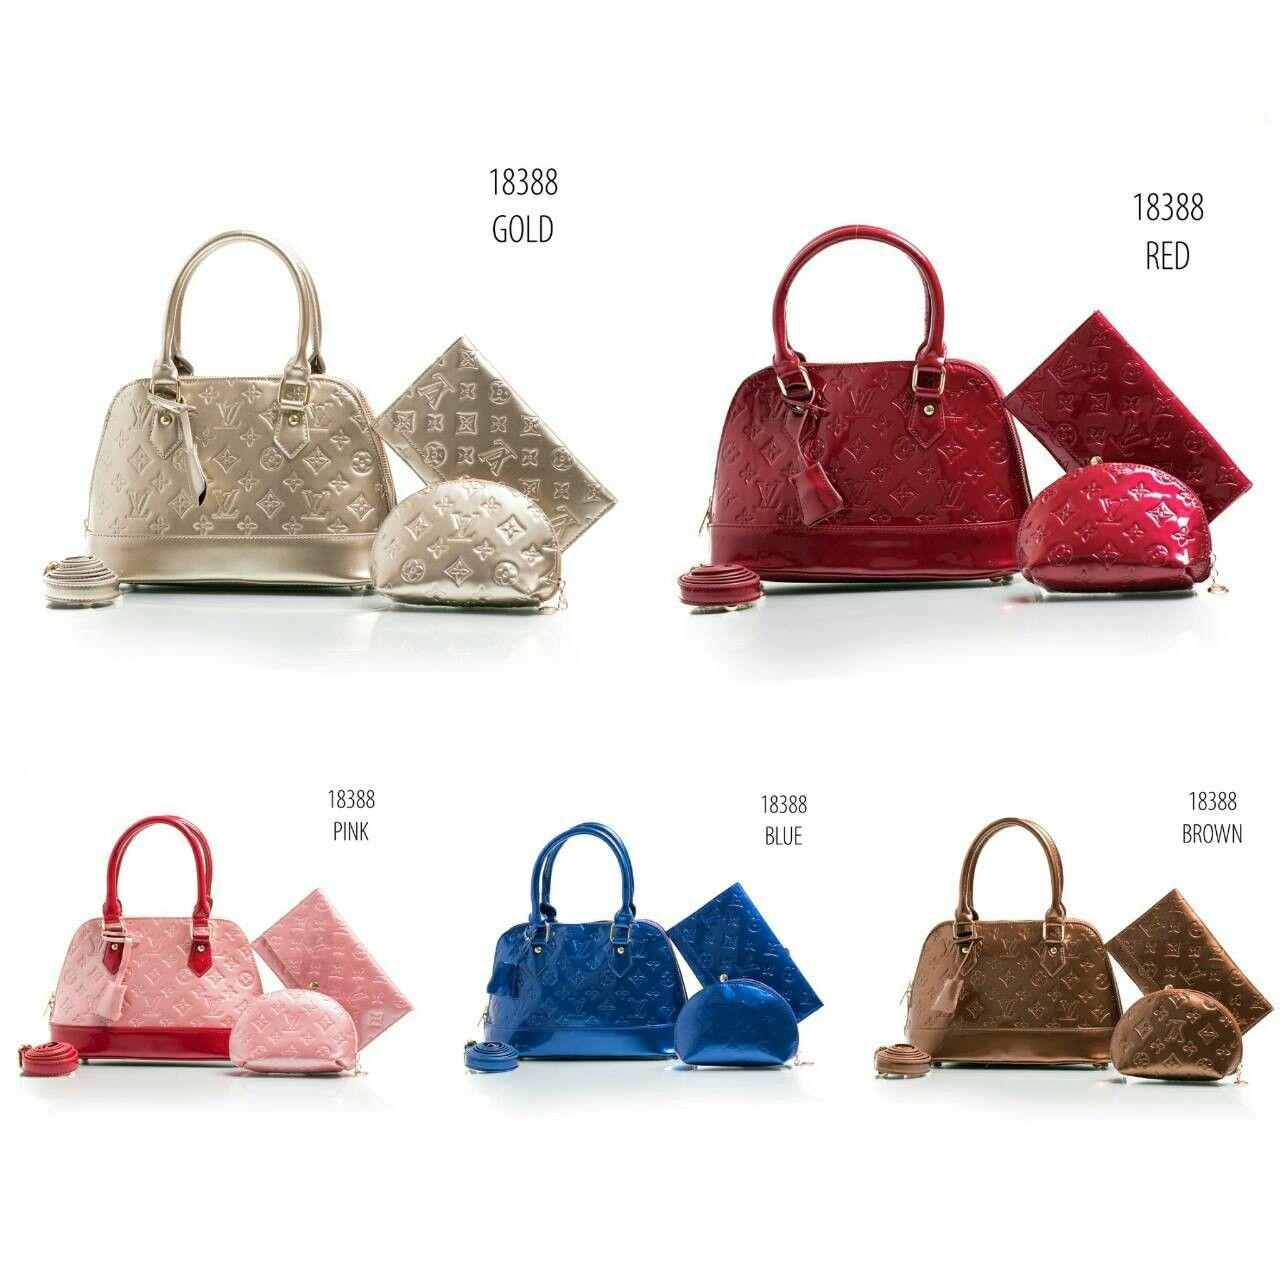 LV 18388 uk 28x12x19cm Semprem Bahan glossy Ada 5 warna   pink ddd7f90935